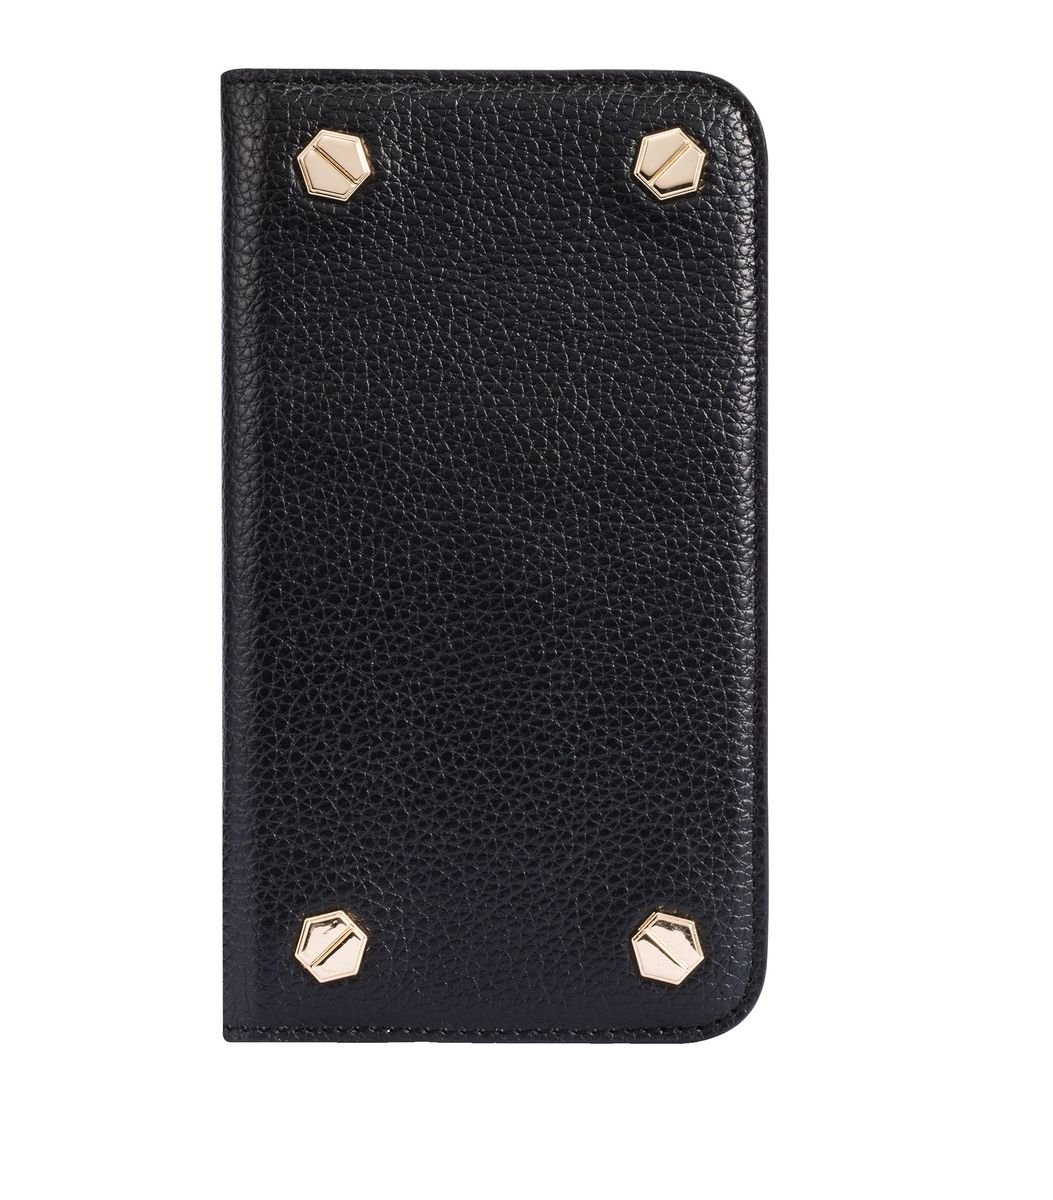 "Apple Iphone 6/6s (4.7"") Hex-shine 系列義大利高級牛皮時尚手機套 (黑色荔枝條紋)"